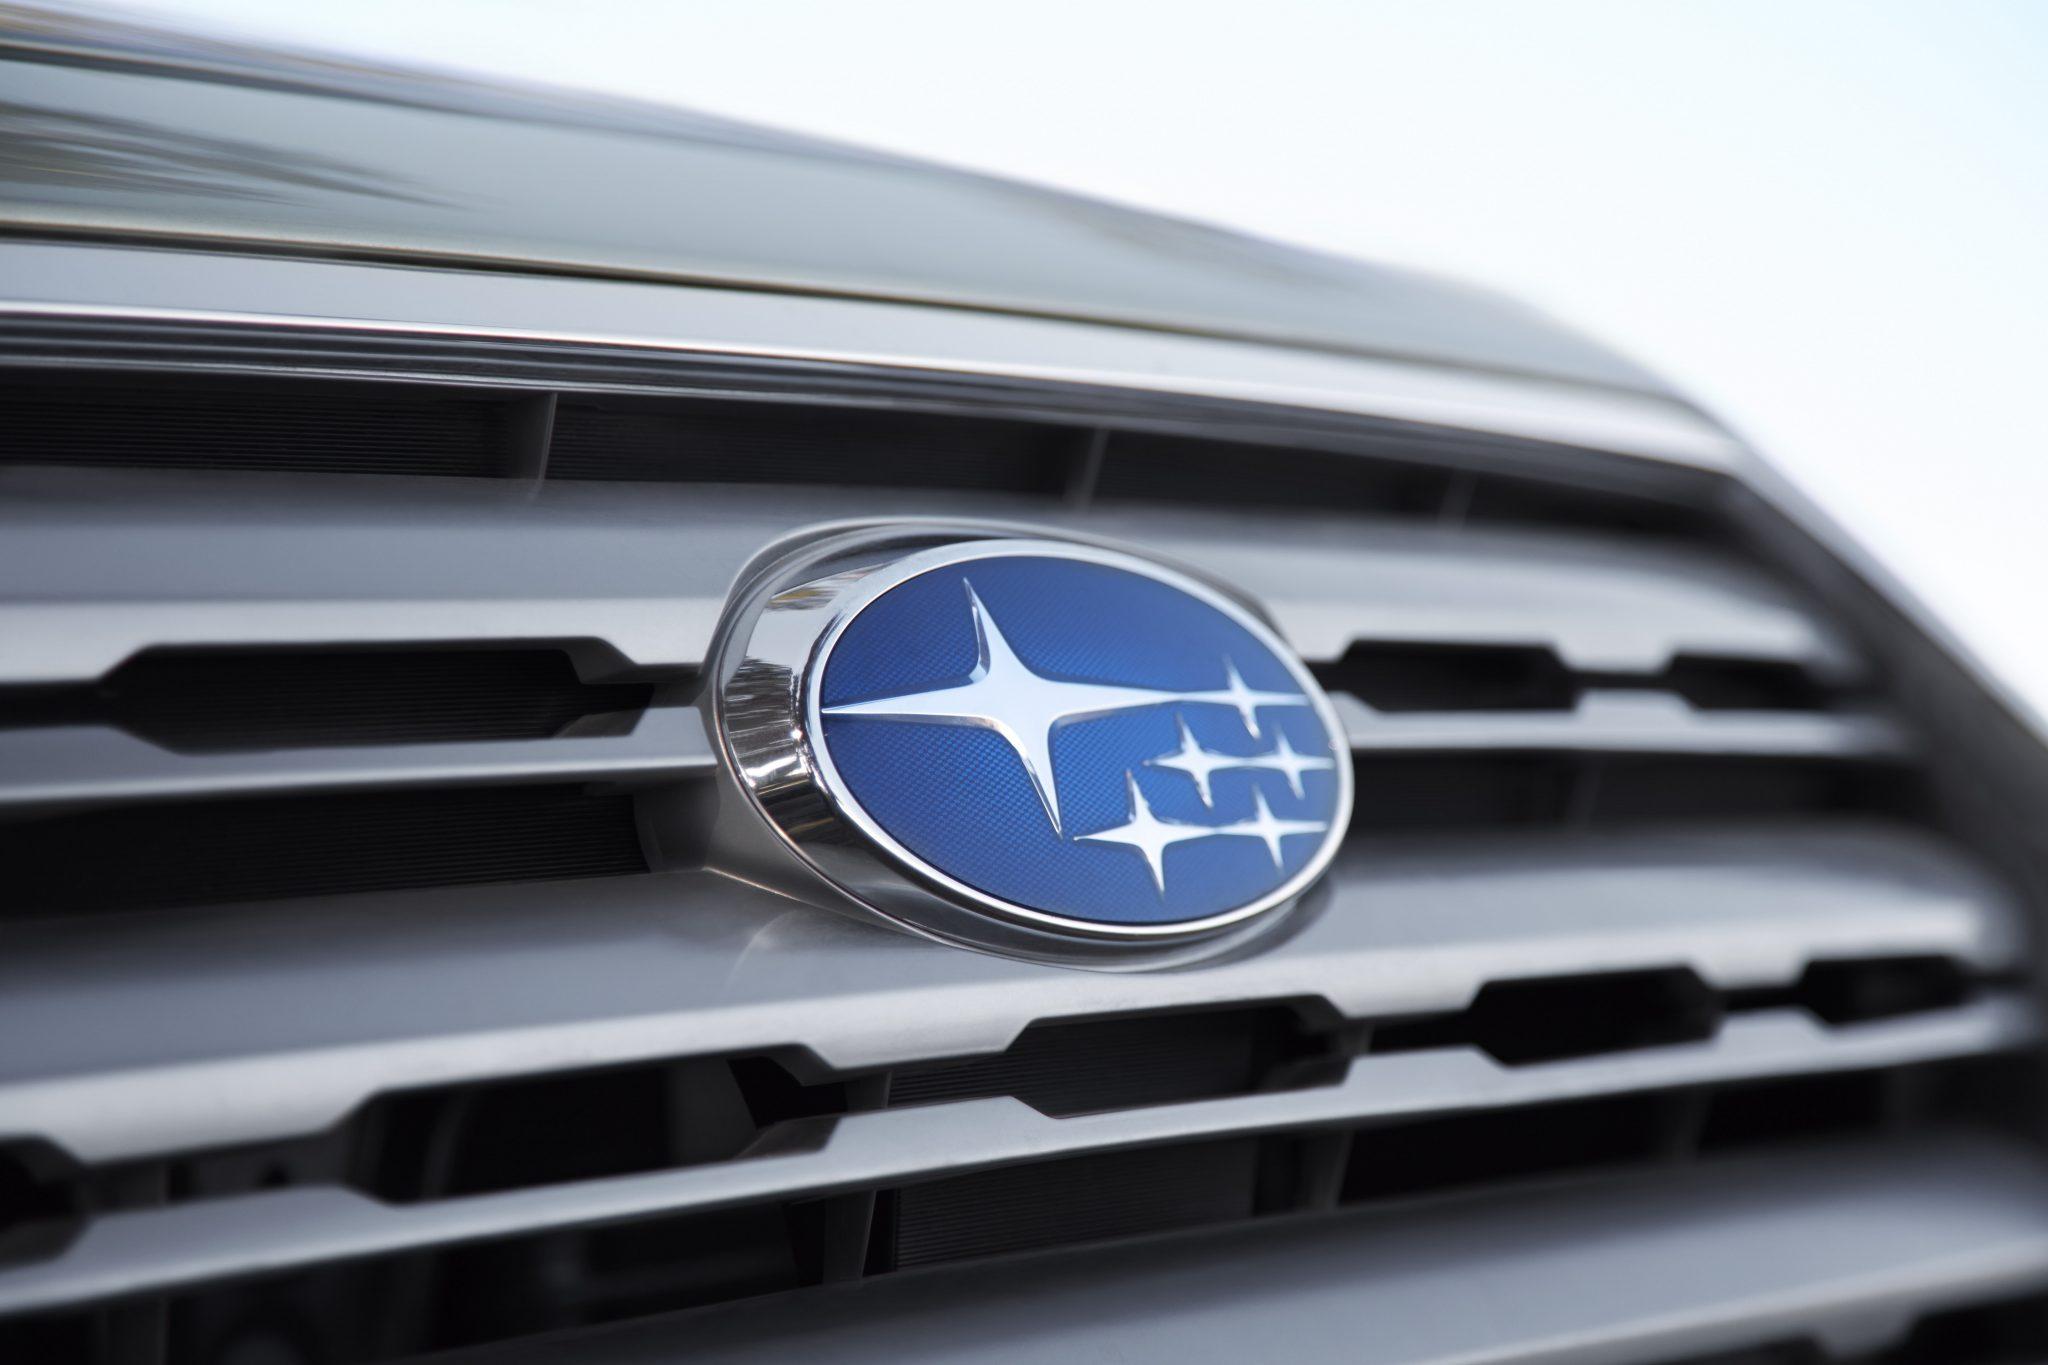 Subaru Named Best Resale Value Brand by KBB The News Wheel